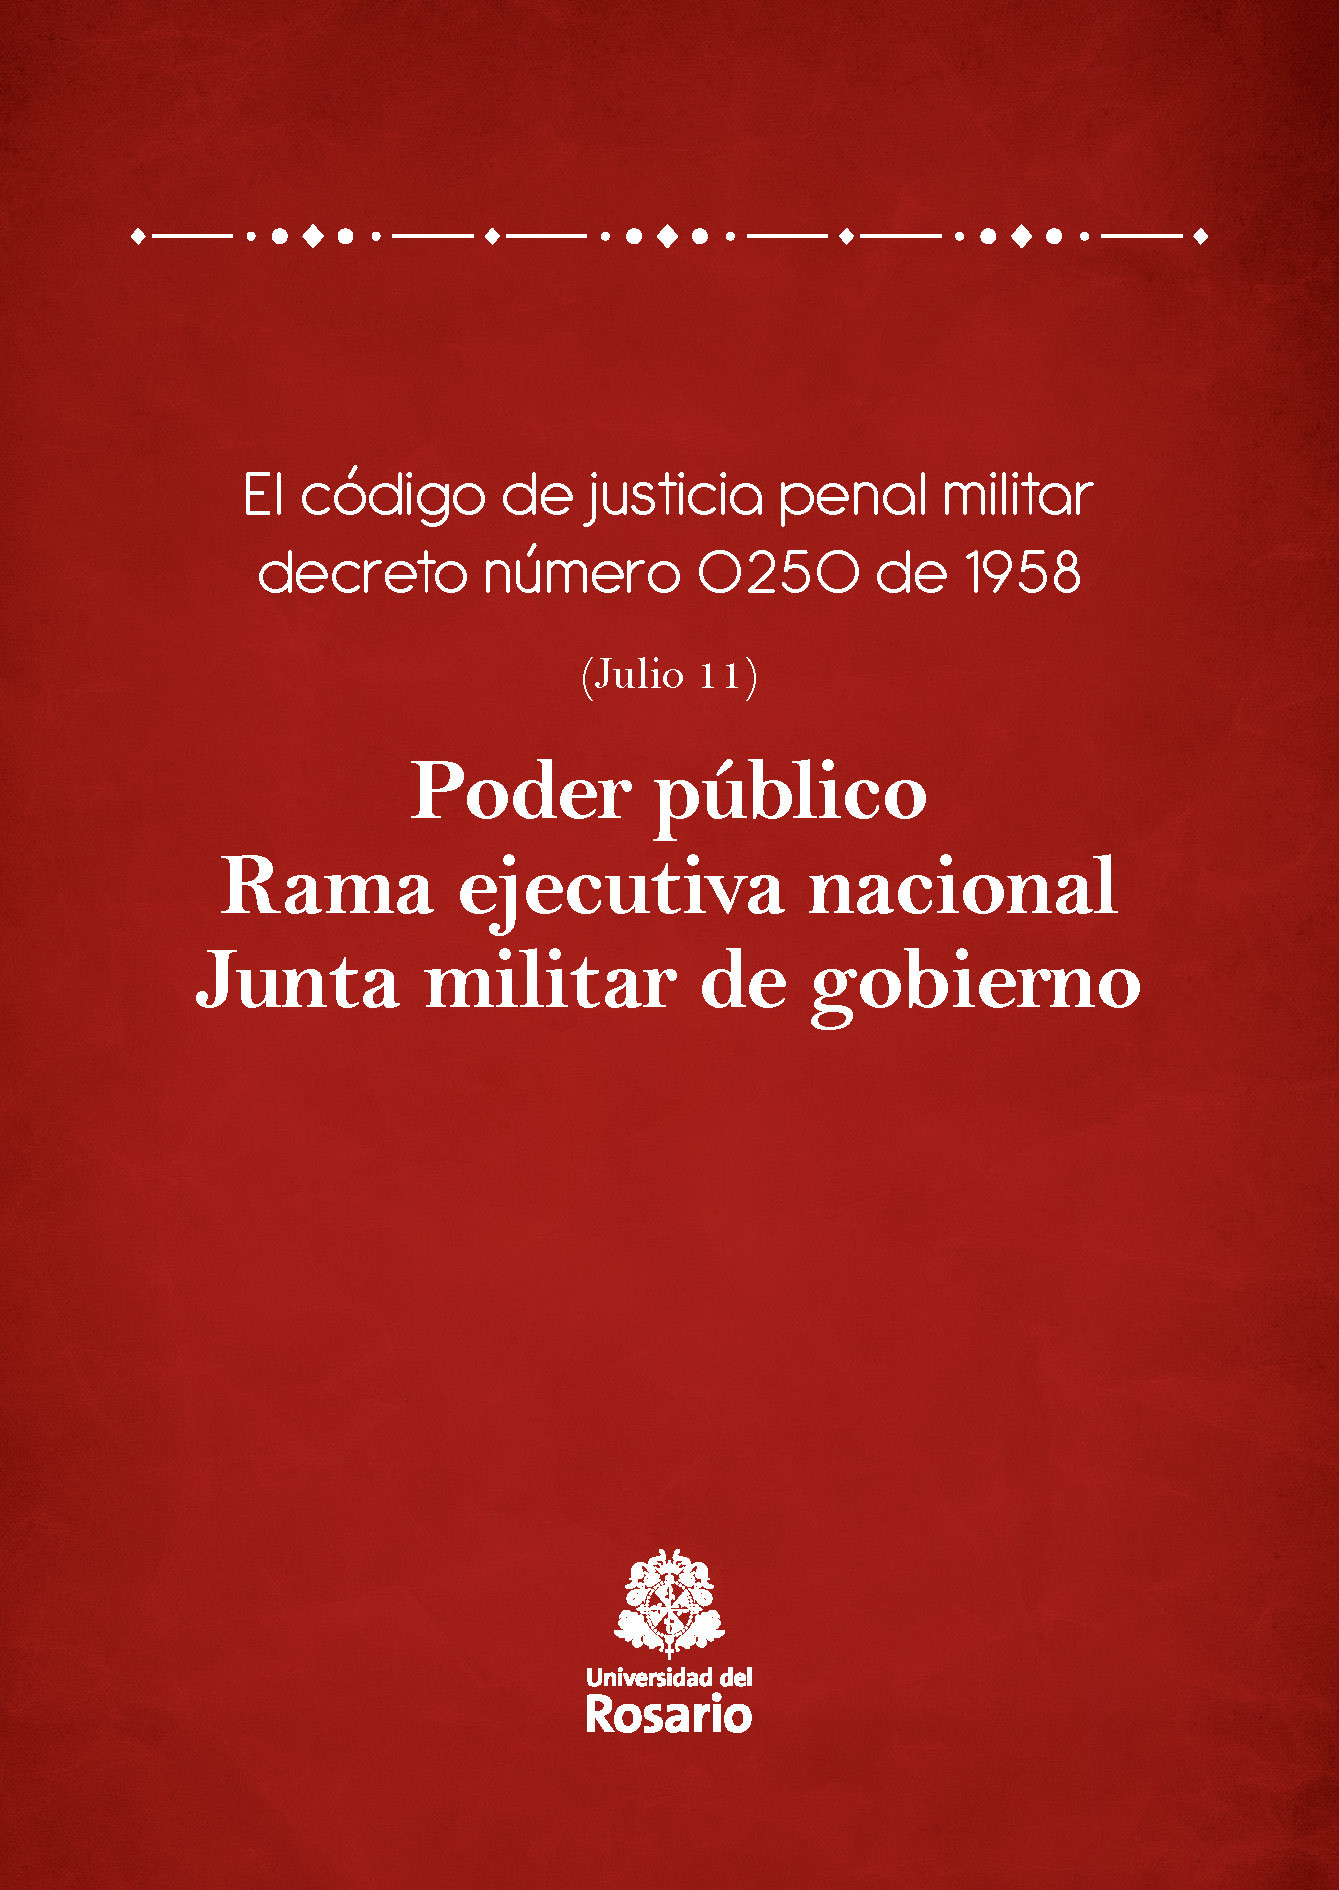 Poder público. Rama ejecutiva nacional. Junta militar de gobierno